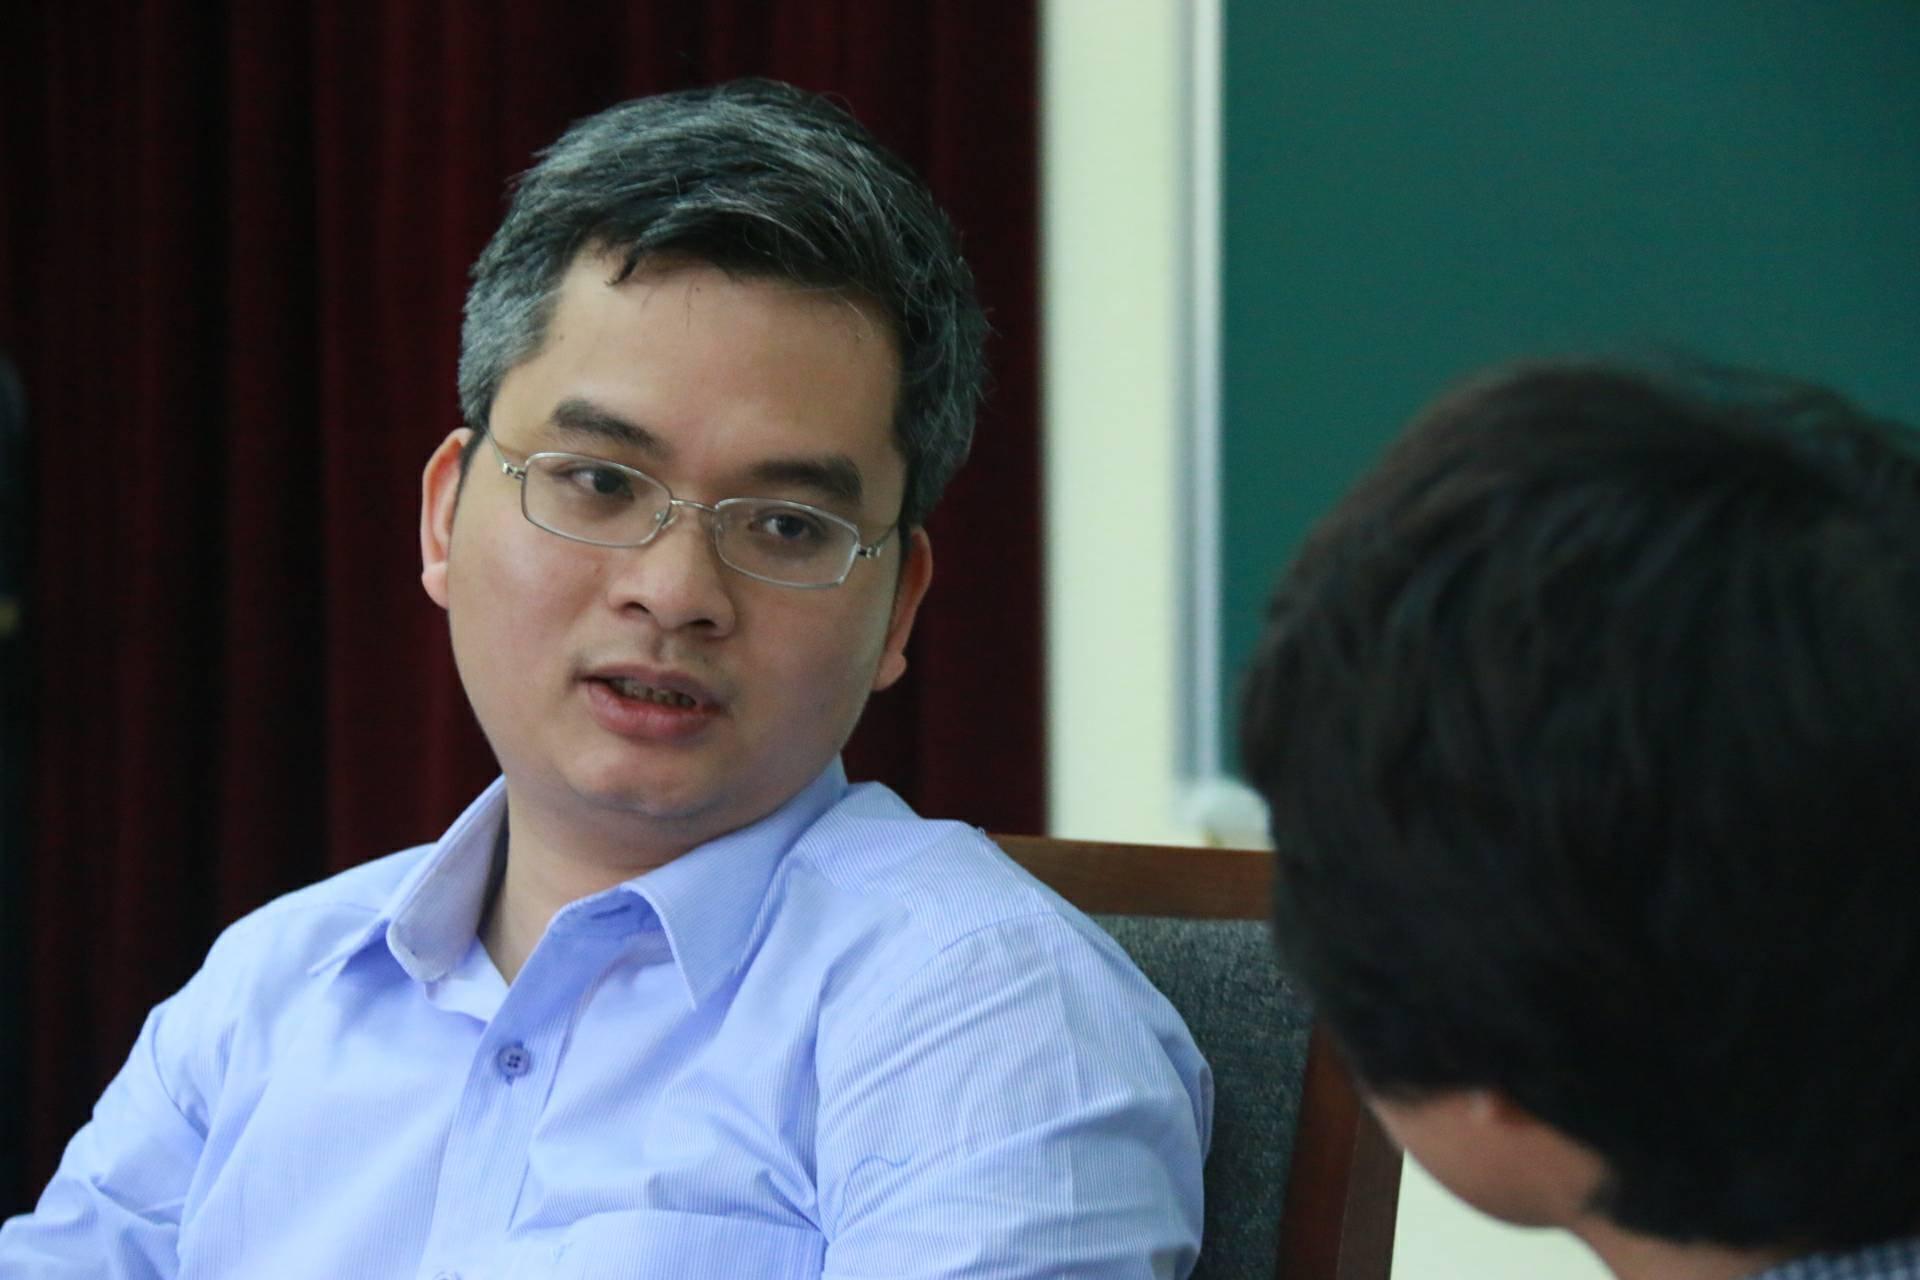 Gặp giáo sư 36 tuổi 'trẻ nhất Việt Nam'